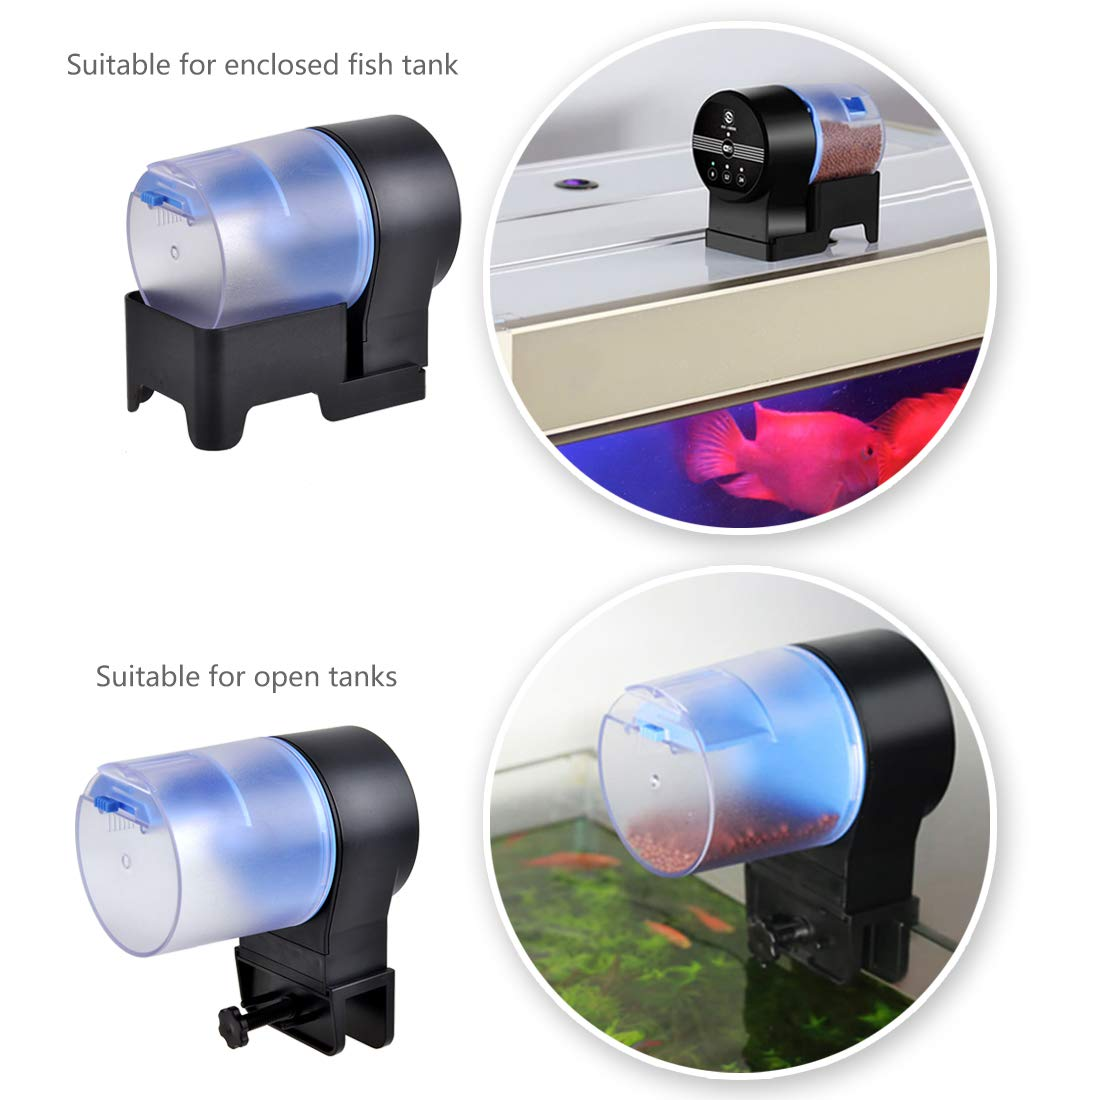 Iseebiz Automatic Tank Feeder Koi Goldfish Feeder Aquariums Moisture-Proof Intelligent Timing Feeding Machine, 2 Fish Food Dispenser. by Iseebiz (Image #2)